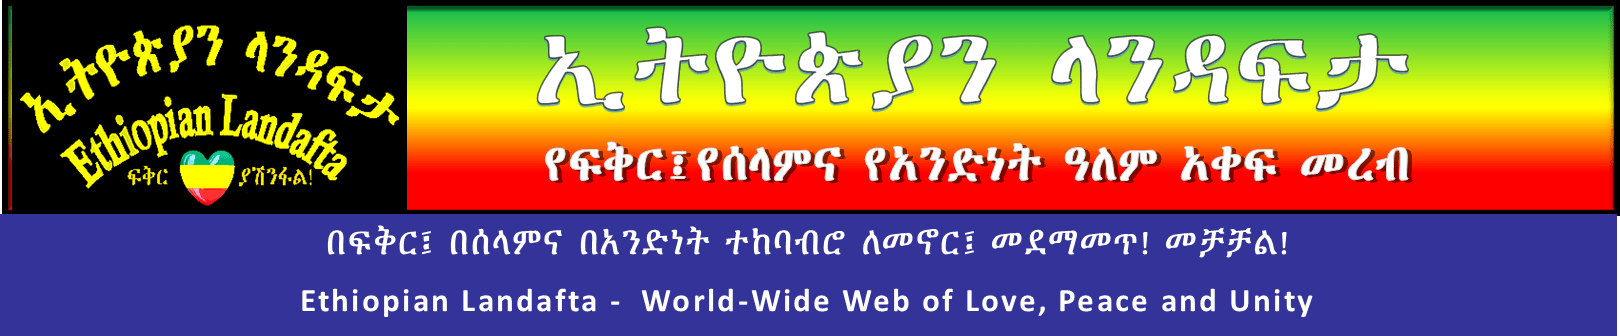 Ethiopian Landafta